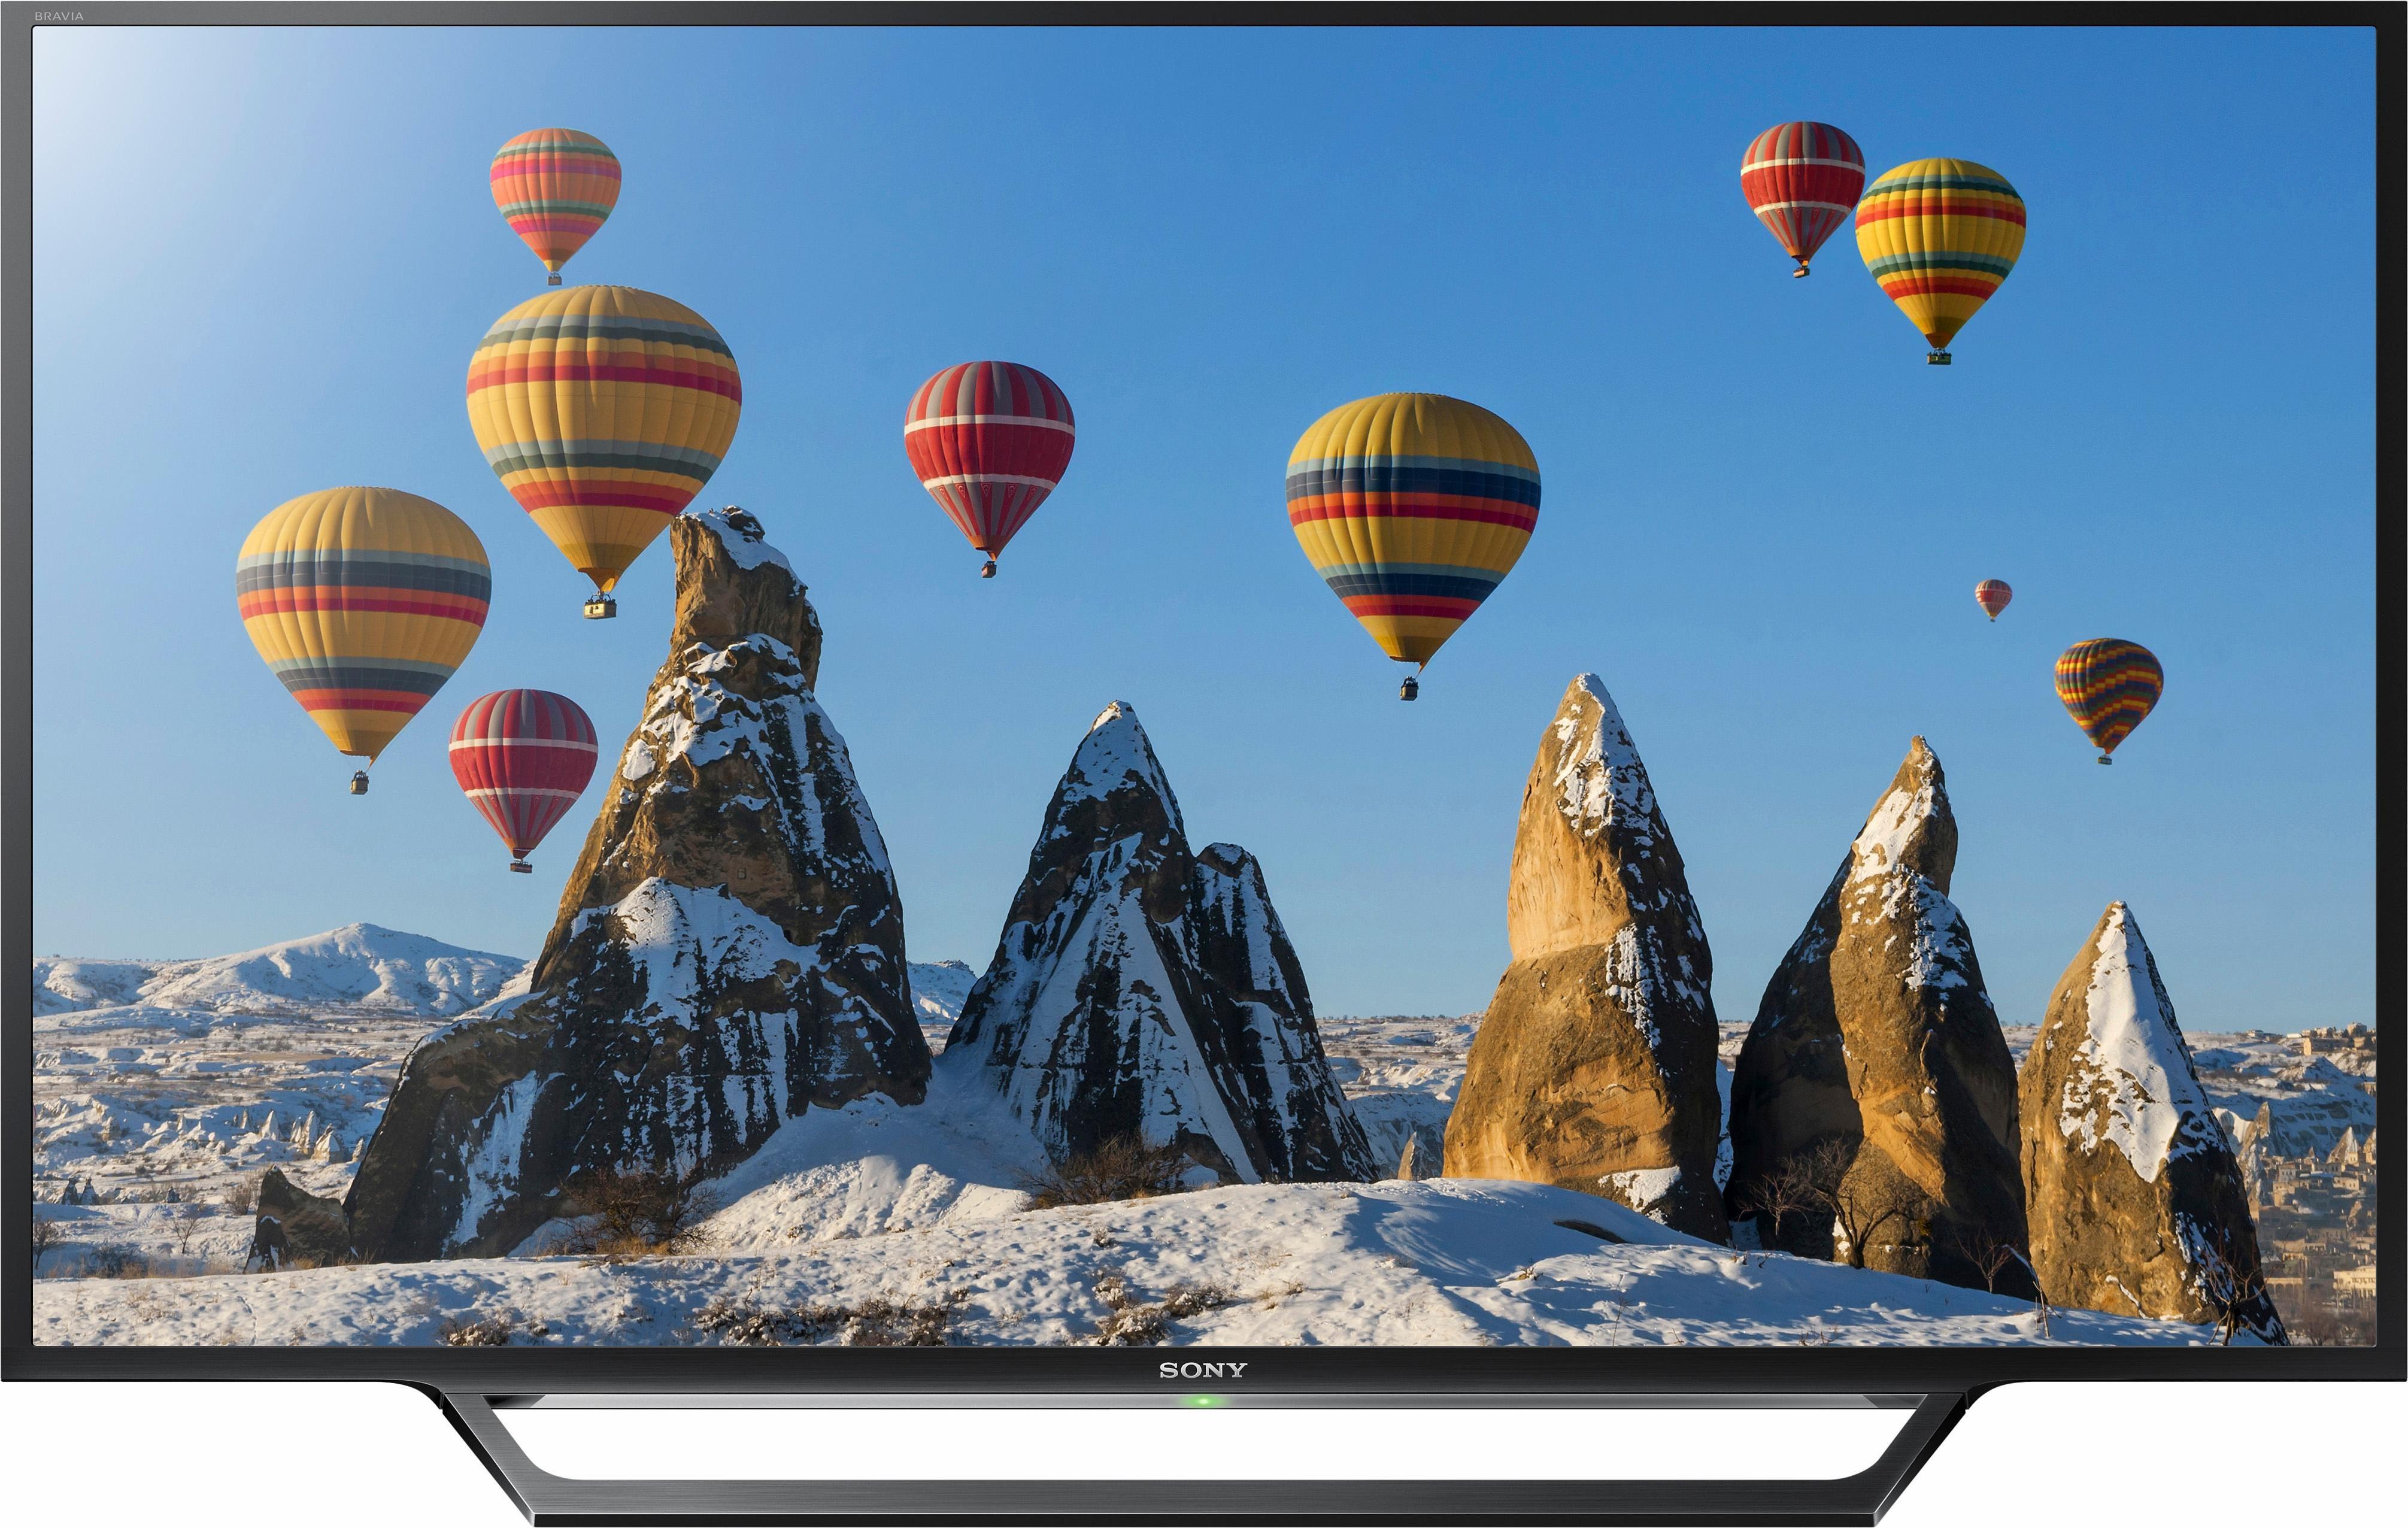 Sony BRAVIA KDL-32WD605, LED Fernseher, 80 cm (32 Zoll), HD-ready 720p, Smart-TV